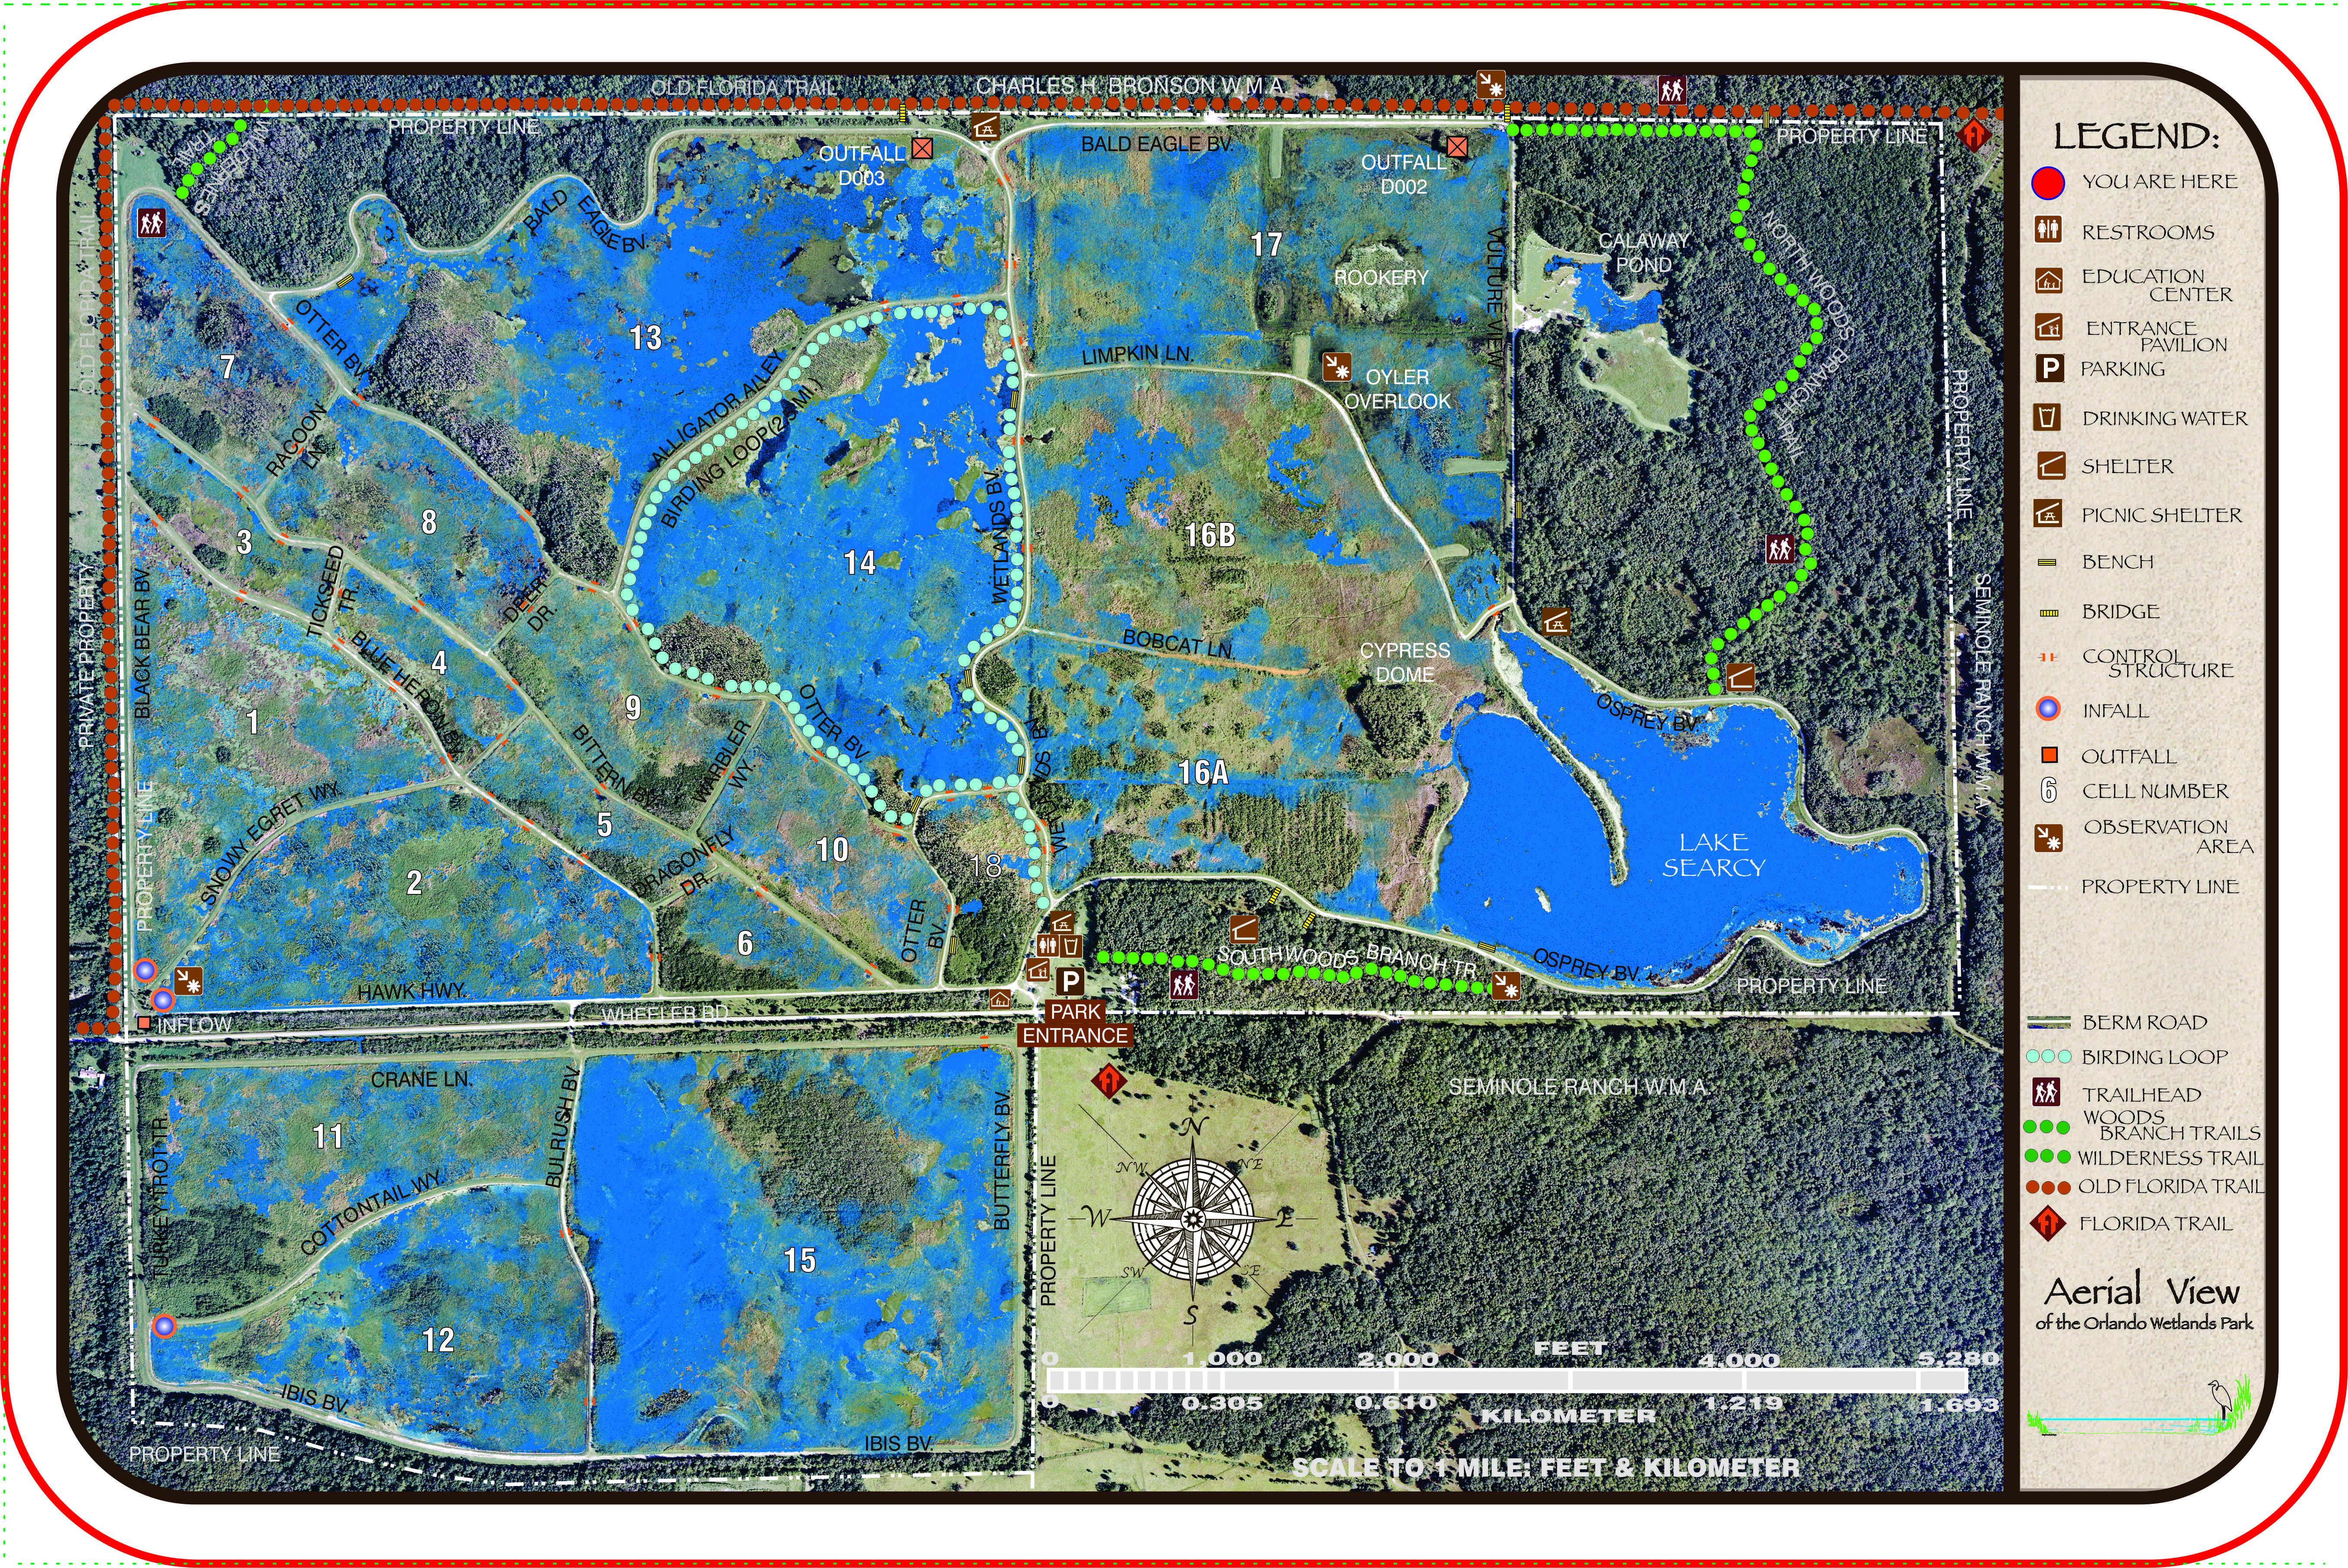 Maps And Brochures | Orlando Wetlands Park - Florida Wetlands Map